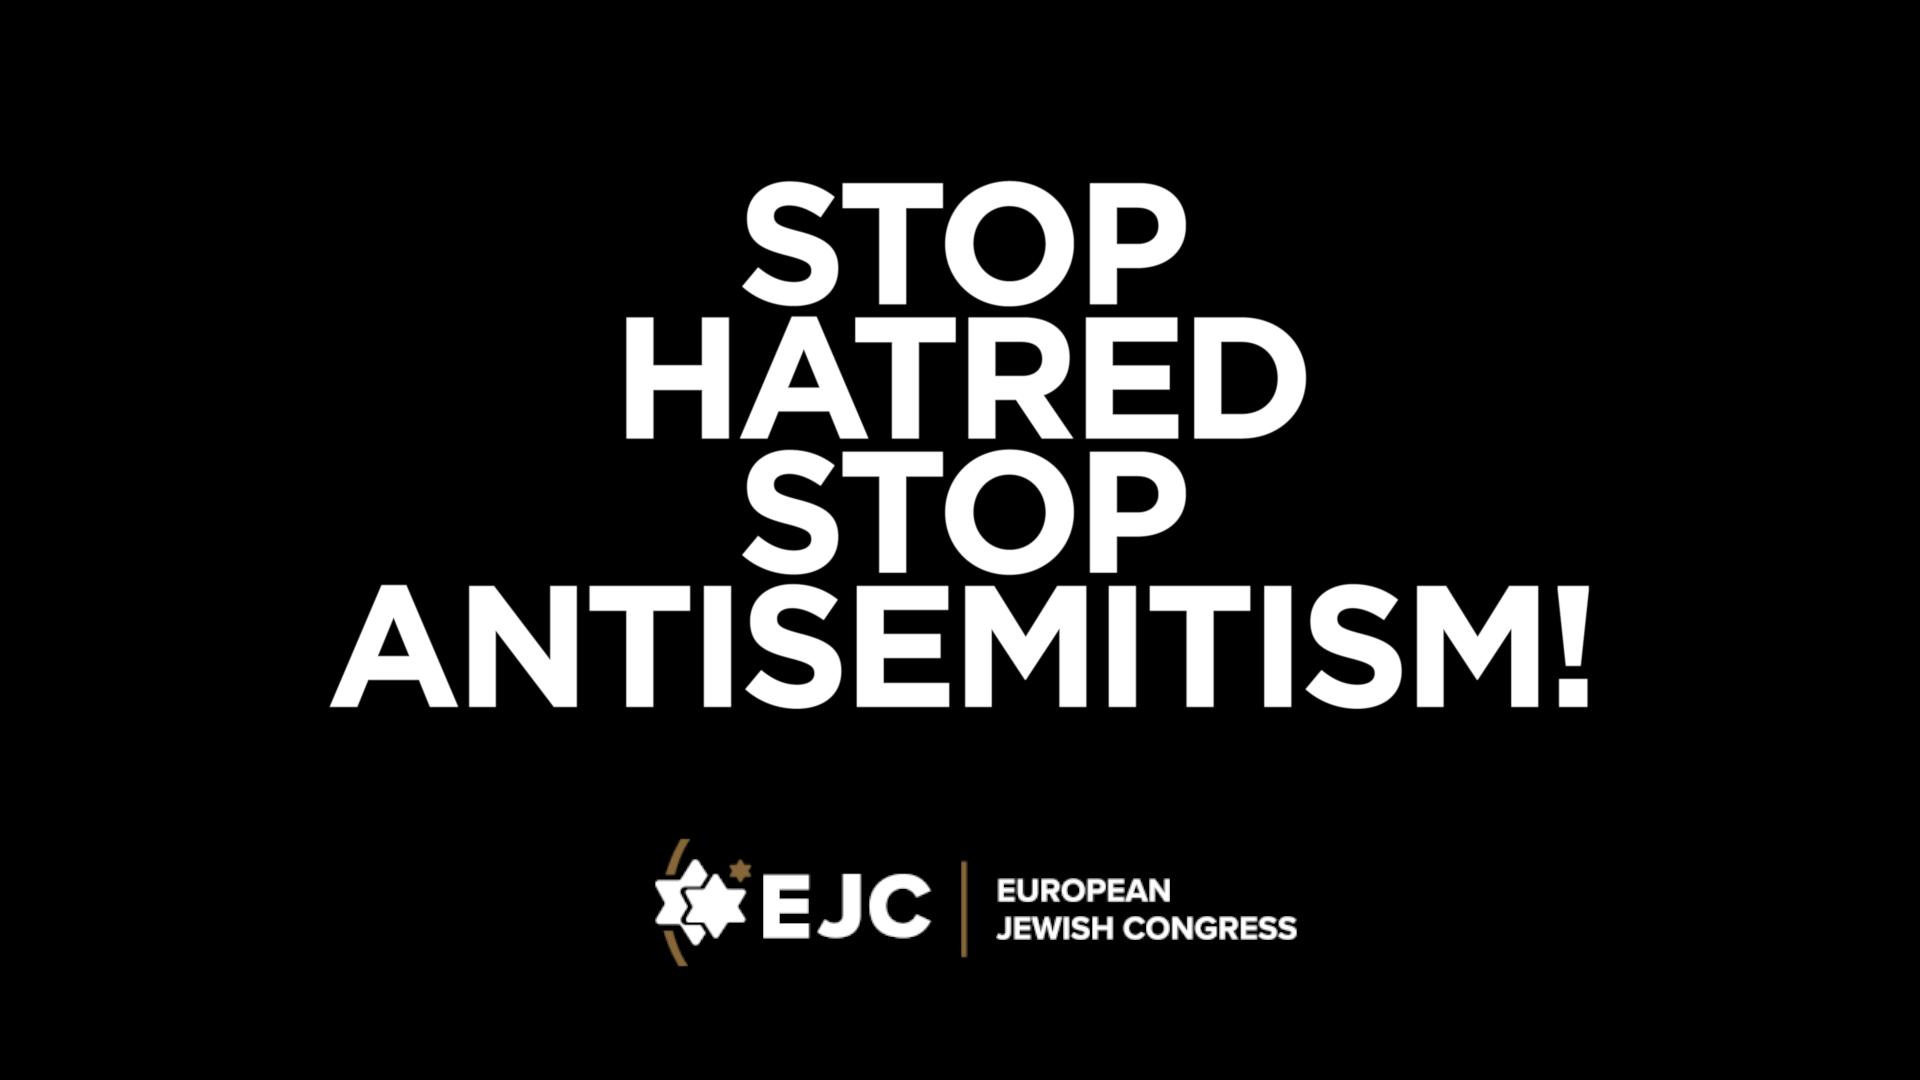 Stop Antisemitism.